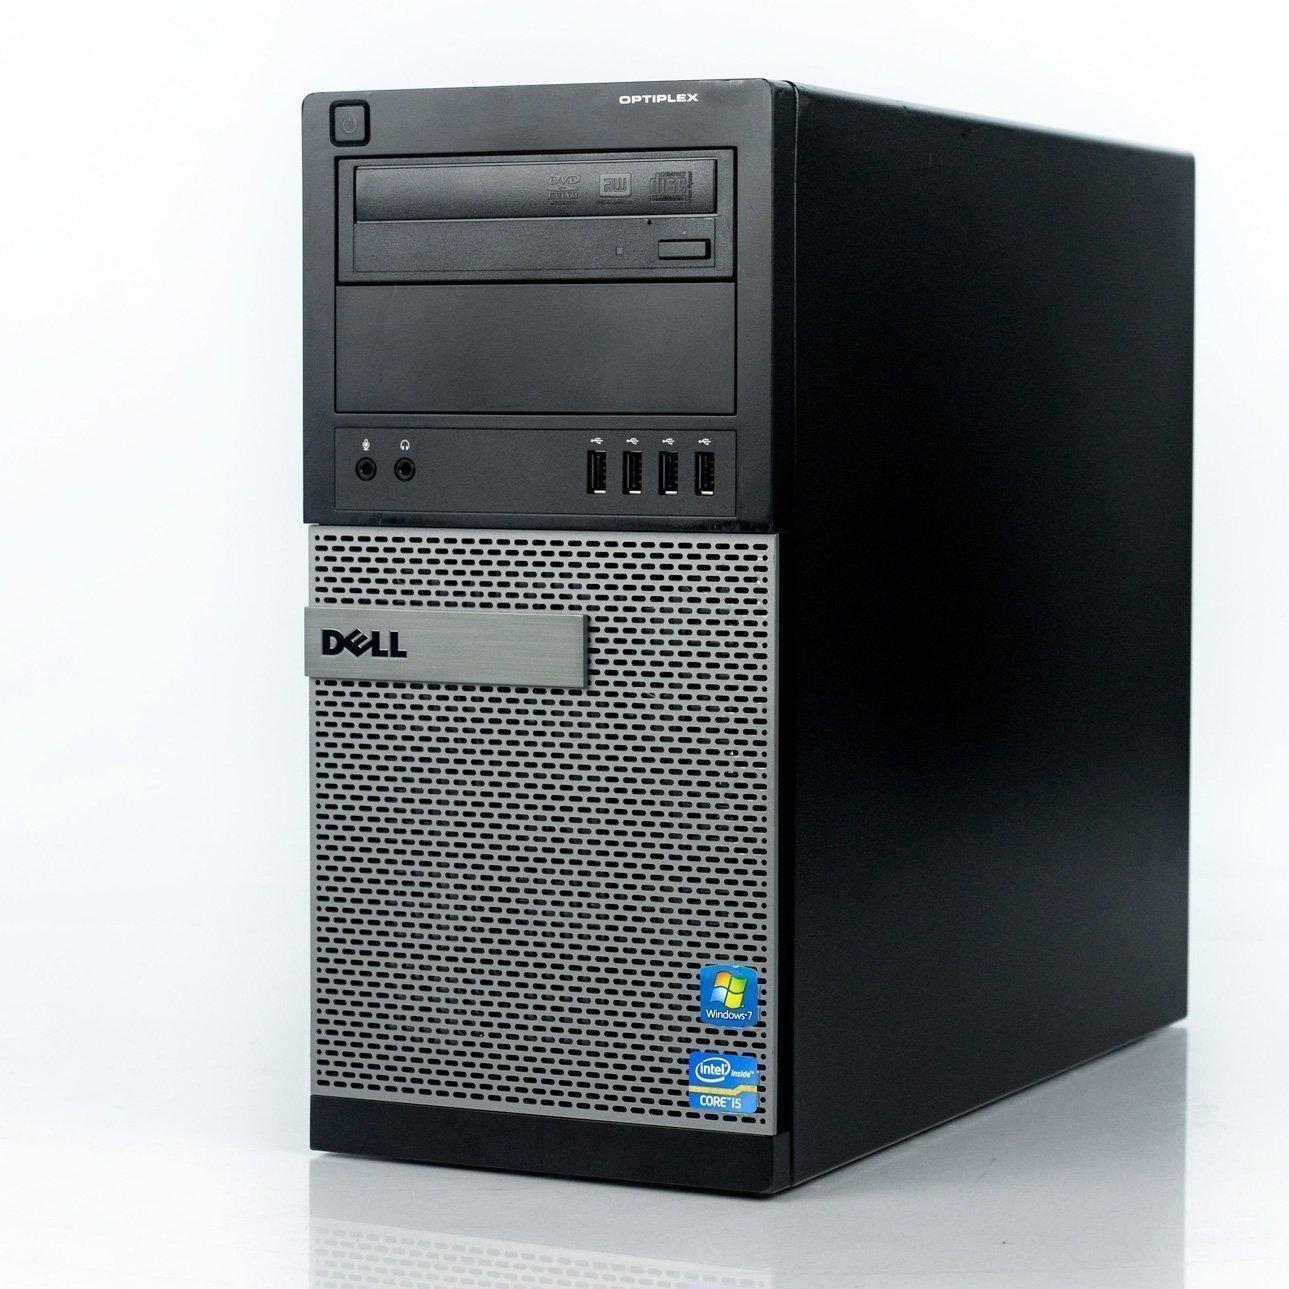 2017 Dell Optiplex 9010 Tower Premium Desktop Computer, Intel Quad-Core i5-3550 up to 3.7GHz, 8GB DDR3 Memory, 2TB HDD+120GB SSD, DVD, WiFi, Windows 10 Professional (Certified Refurbished)